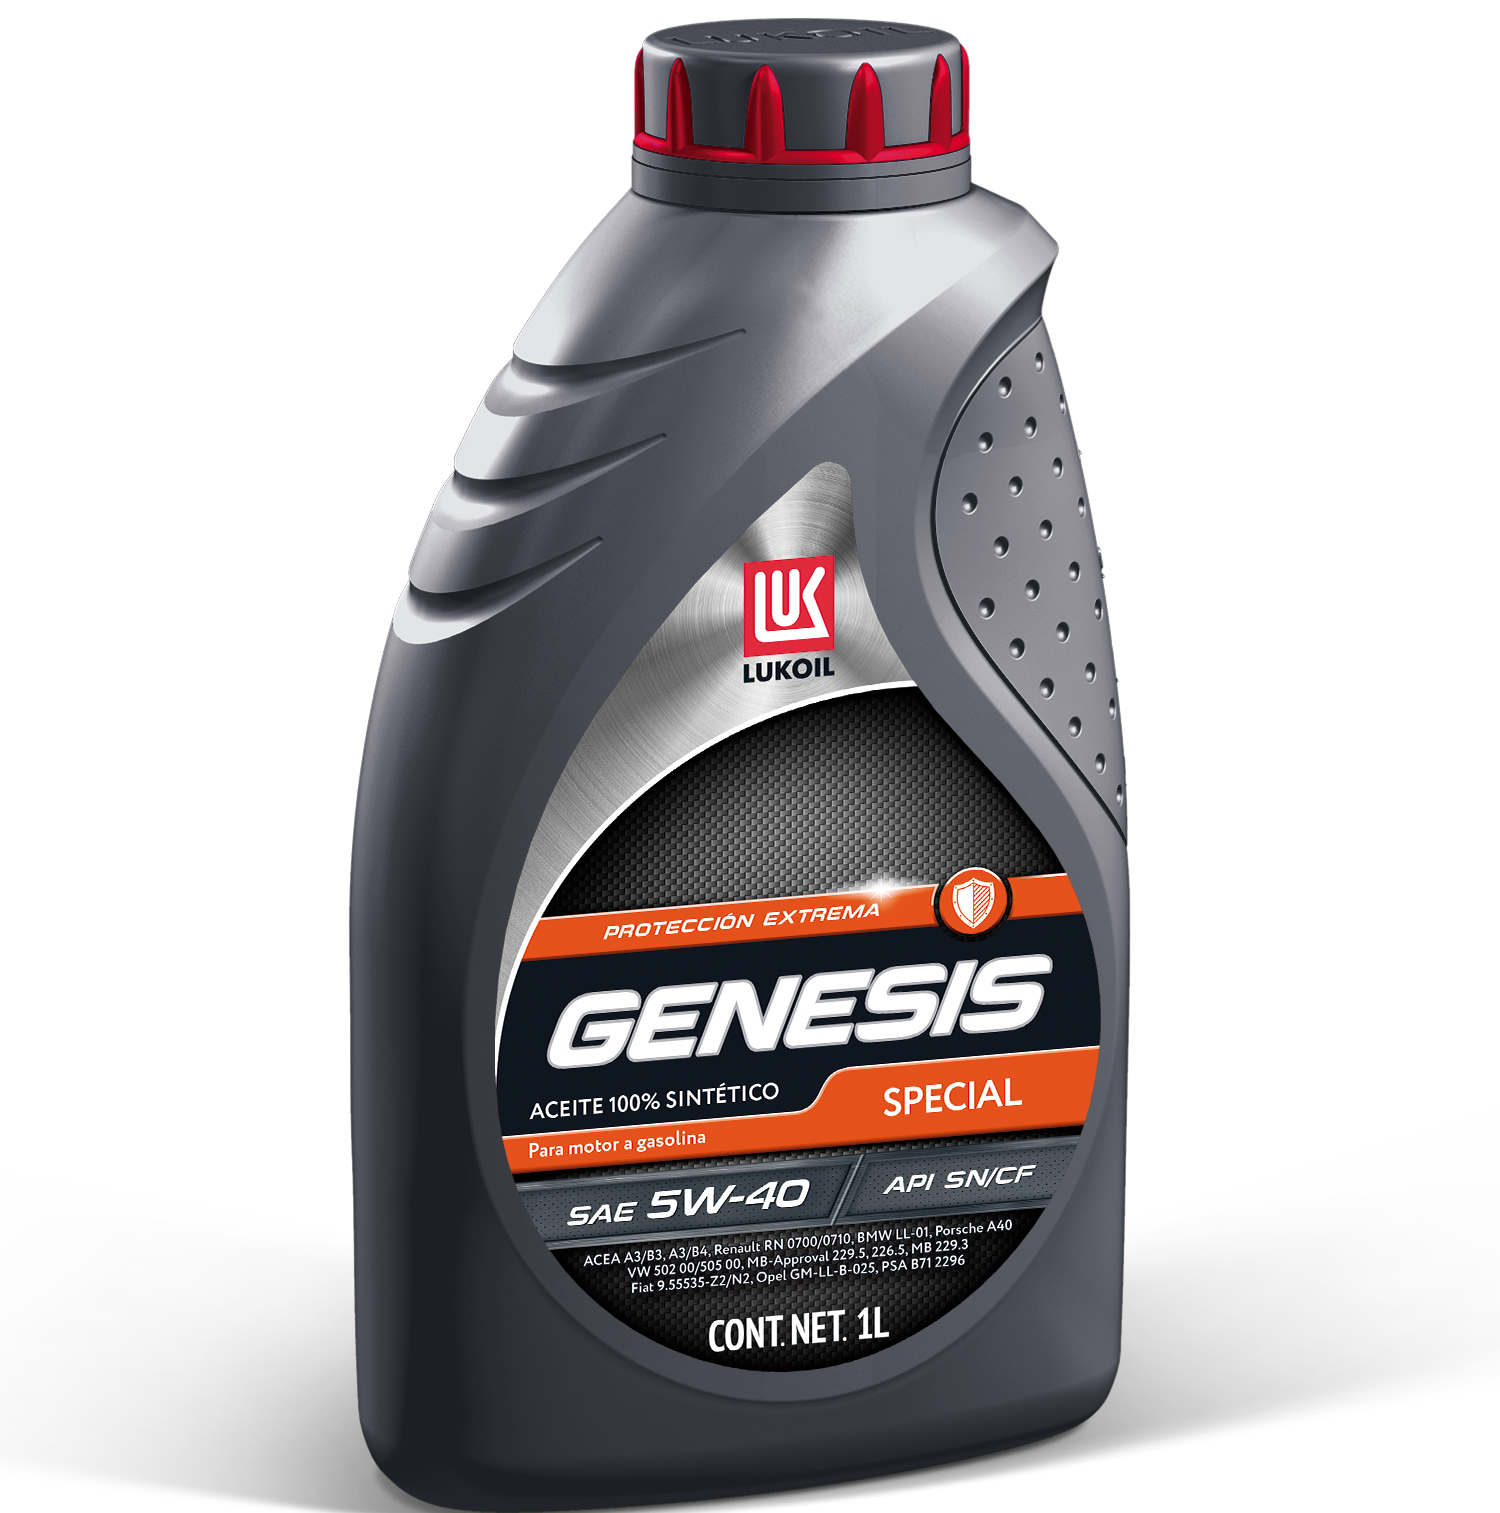 LUKOIL Genesis Special 5W-40_SITE